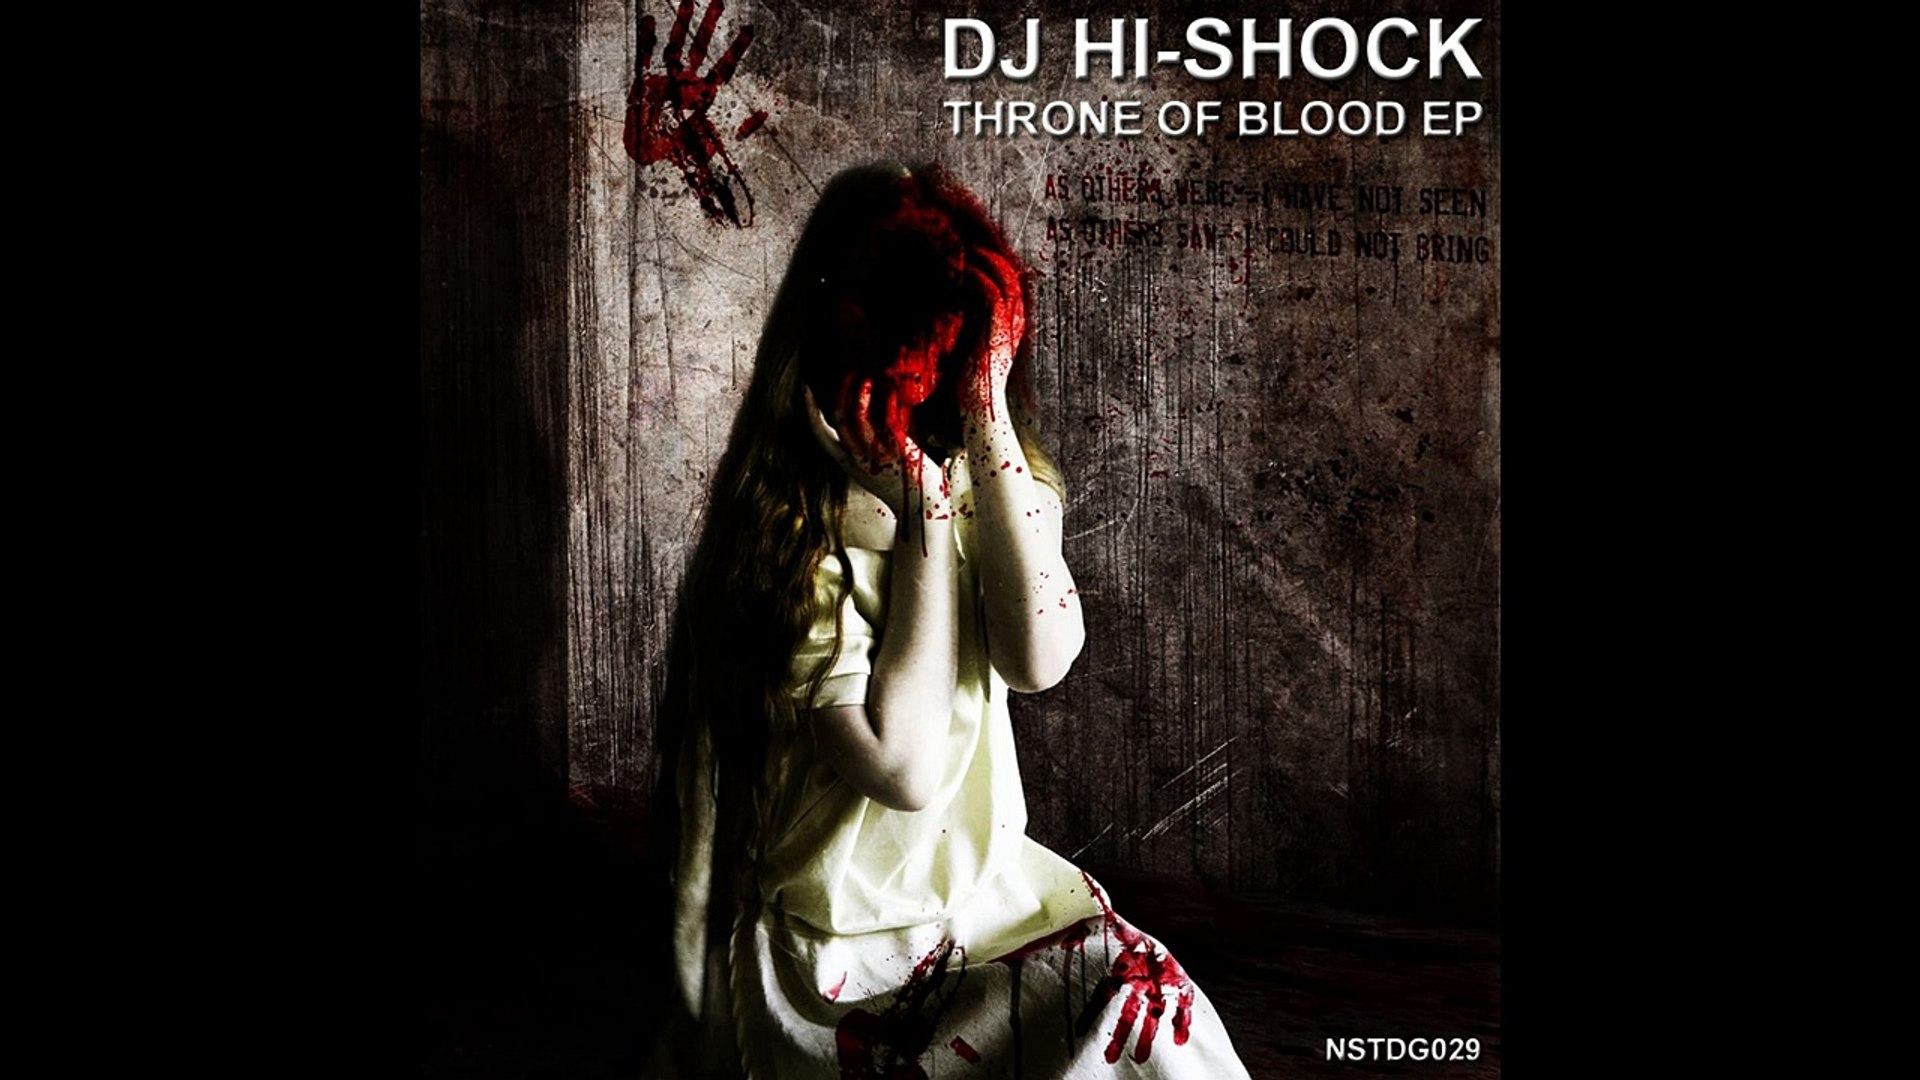 DJ Hi-Shock - Throne Of Blood EP (Nachtstrom Schallplatten) [Full Album]